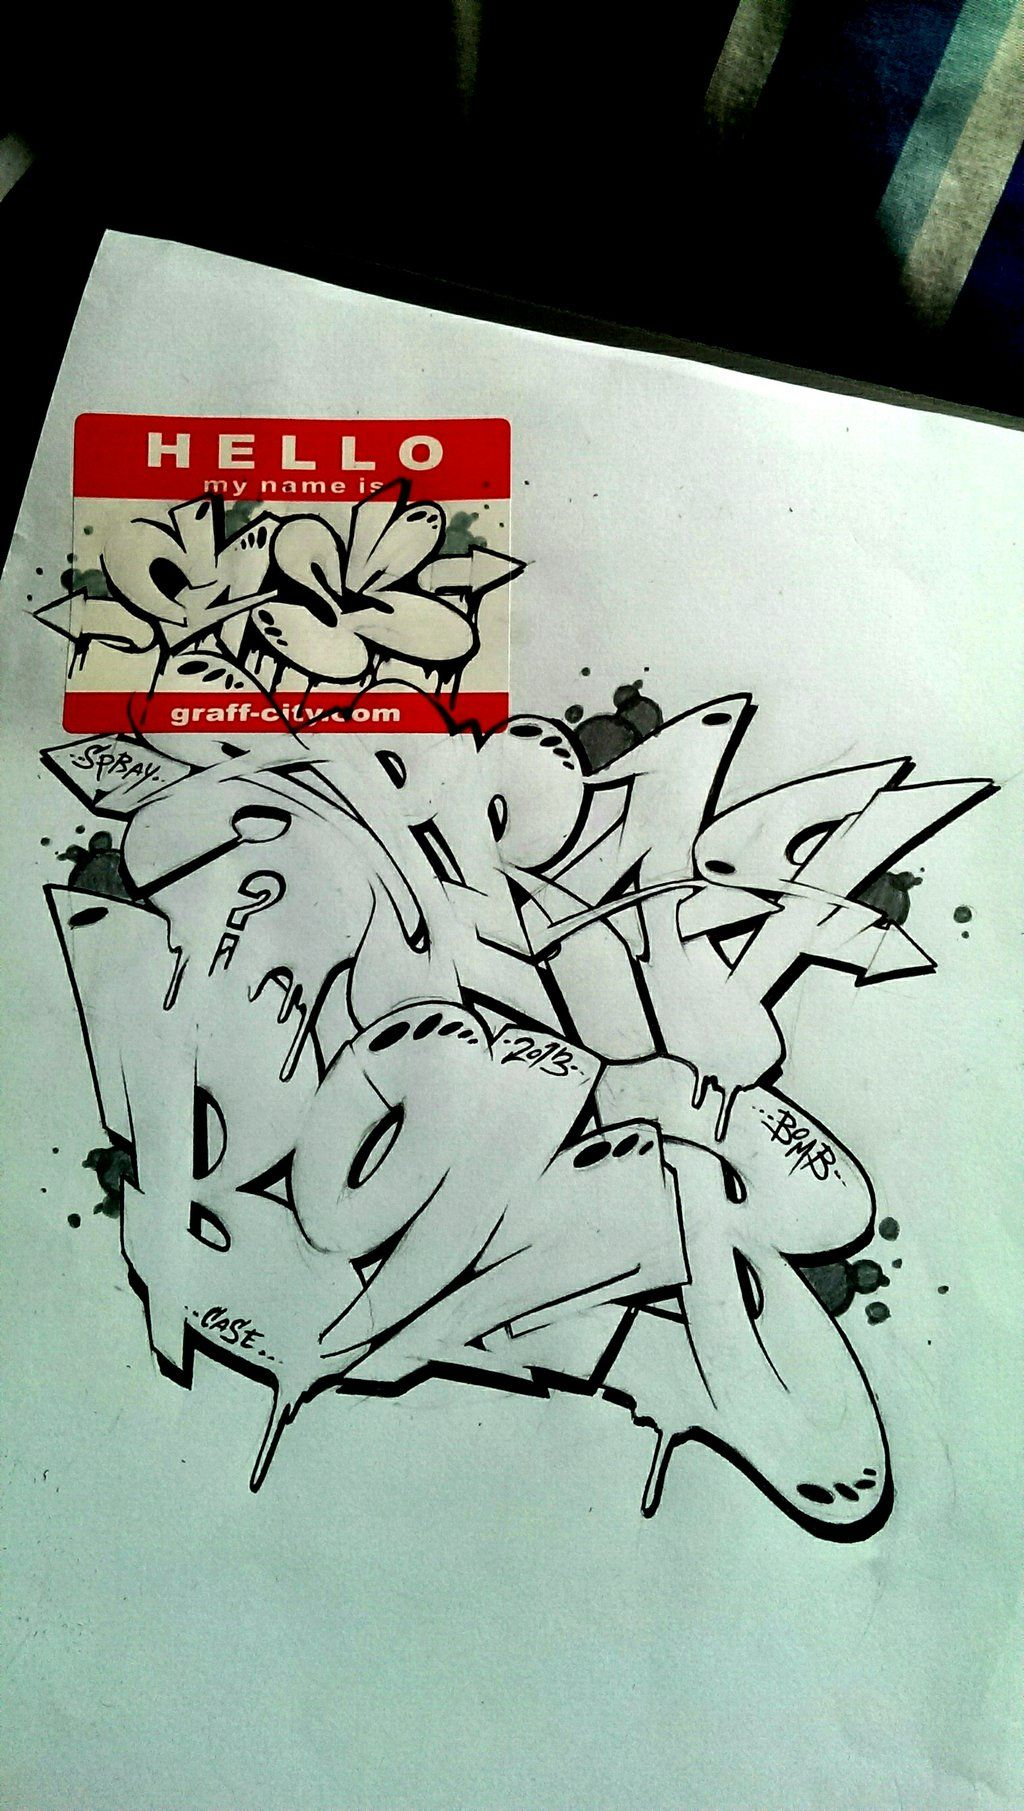 Graffiti art designs - Find This Pin And More On Graffiti Blackbook Sketches Murals